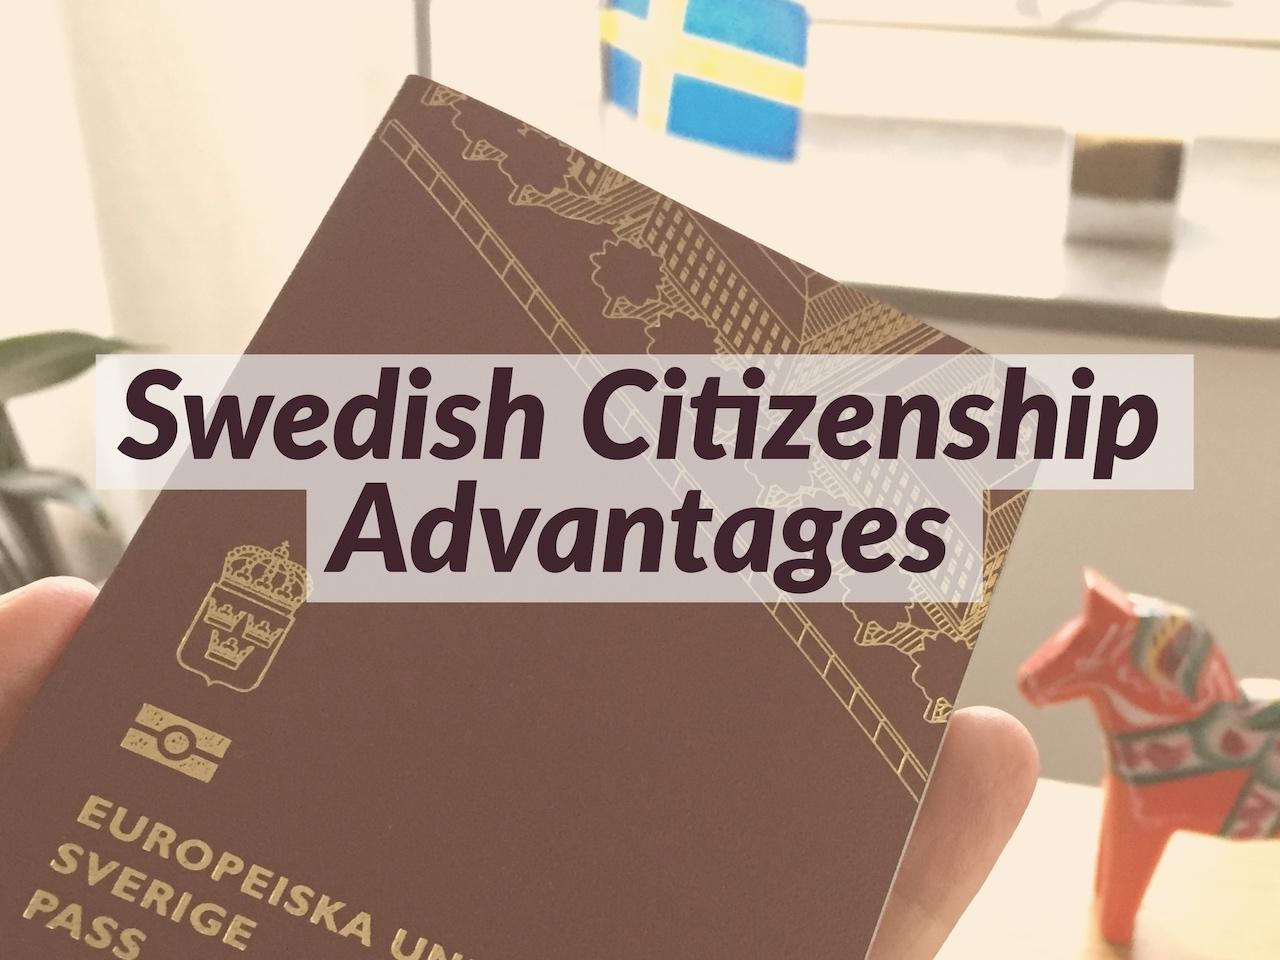 Swedish citizenship advantages